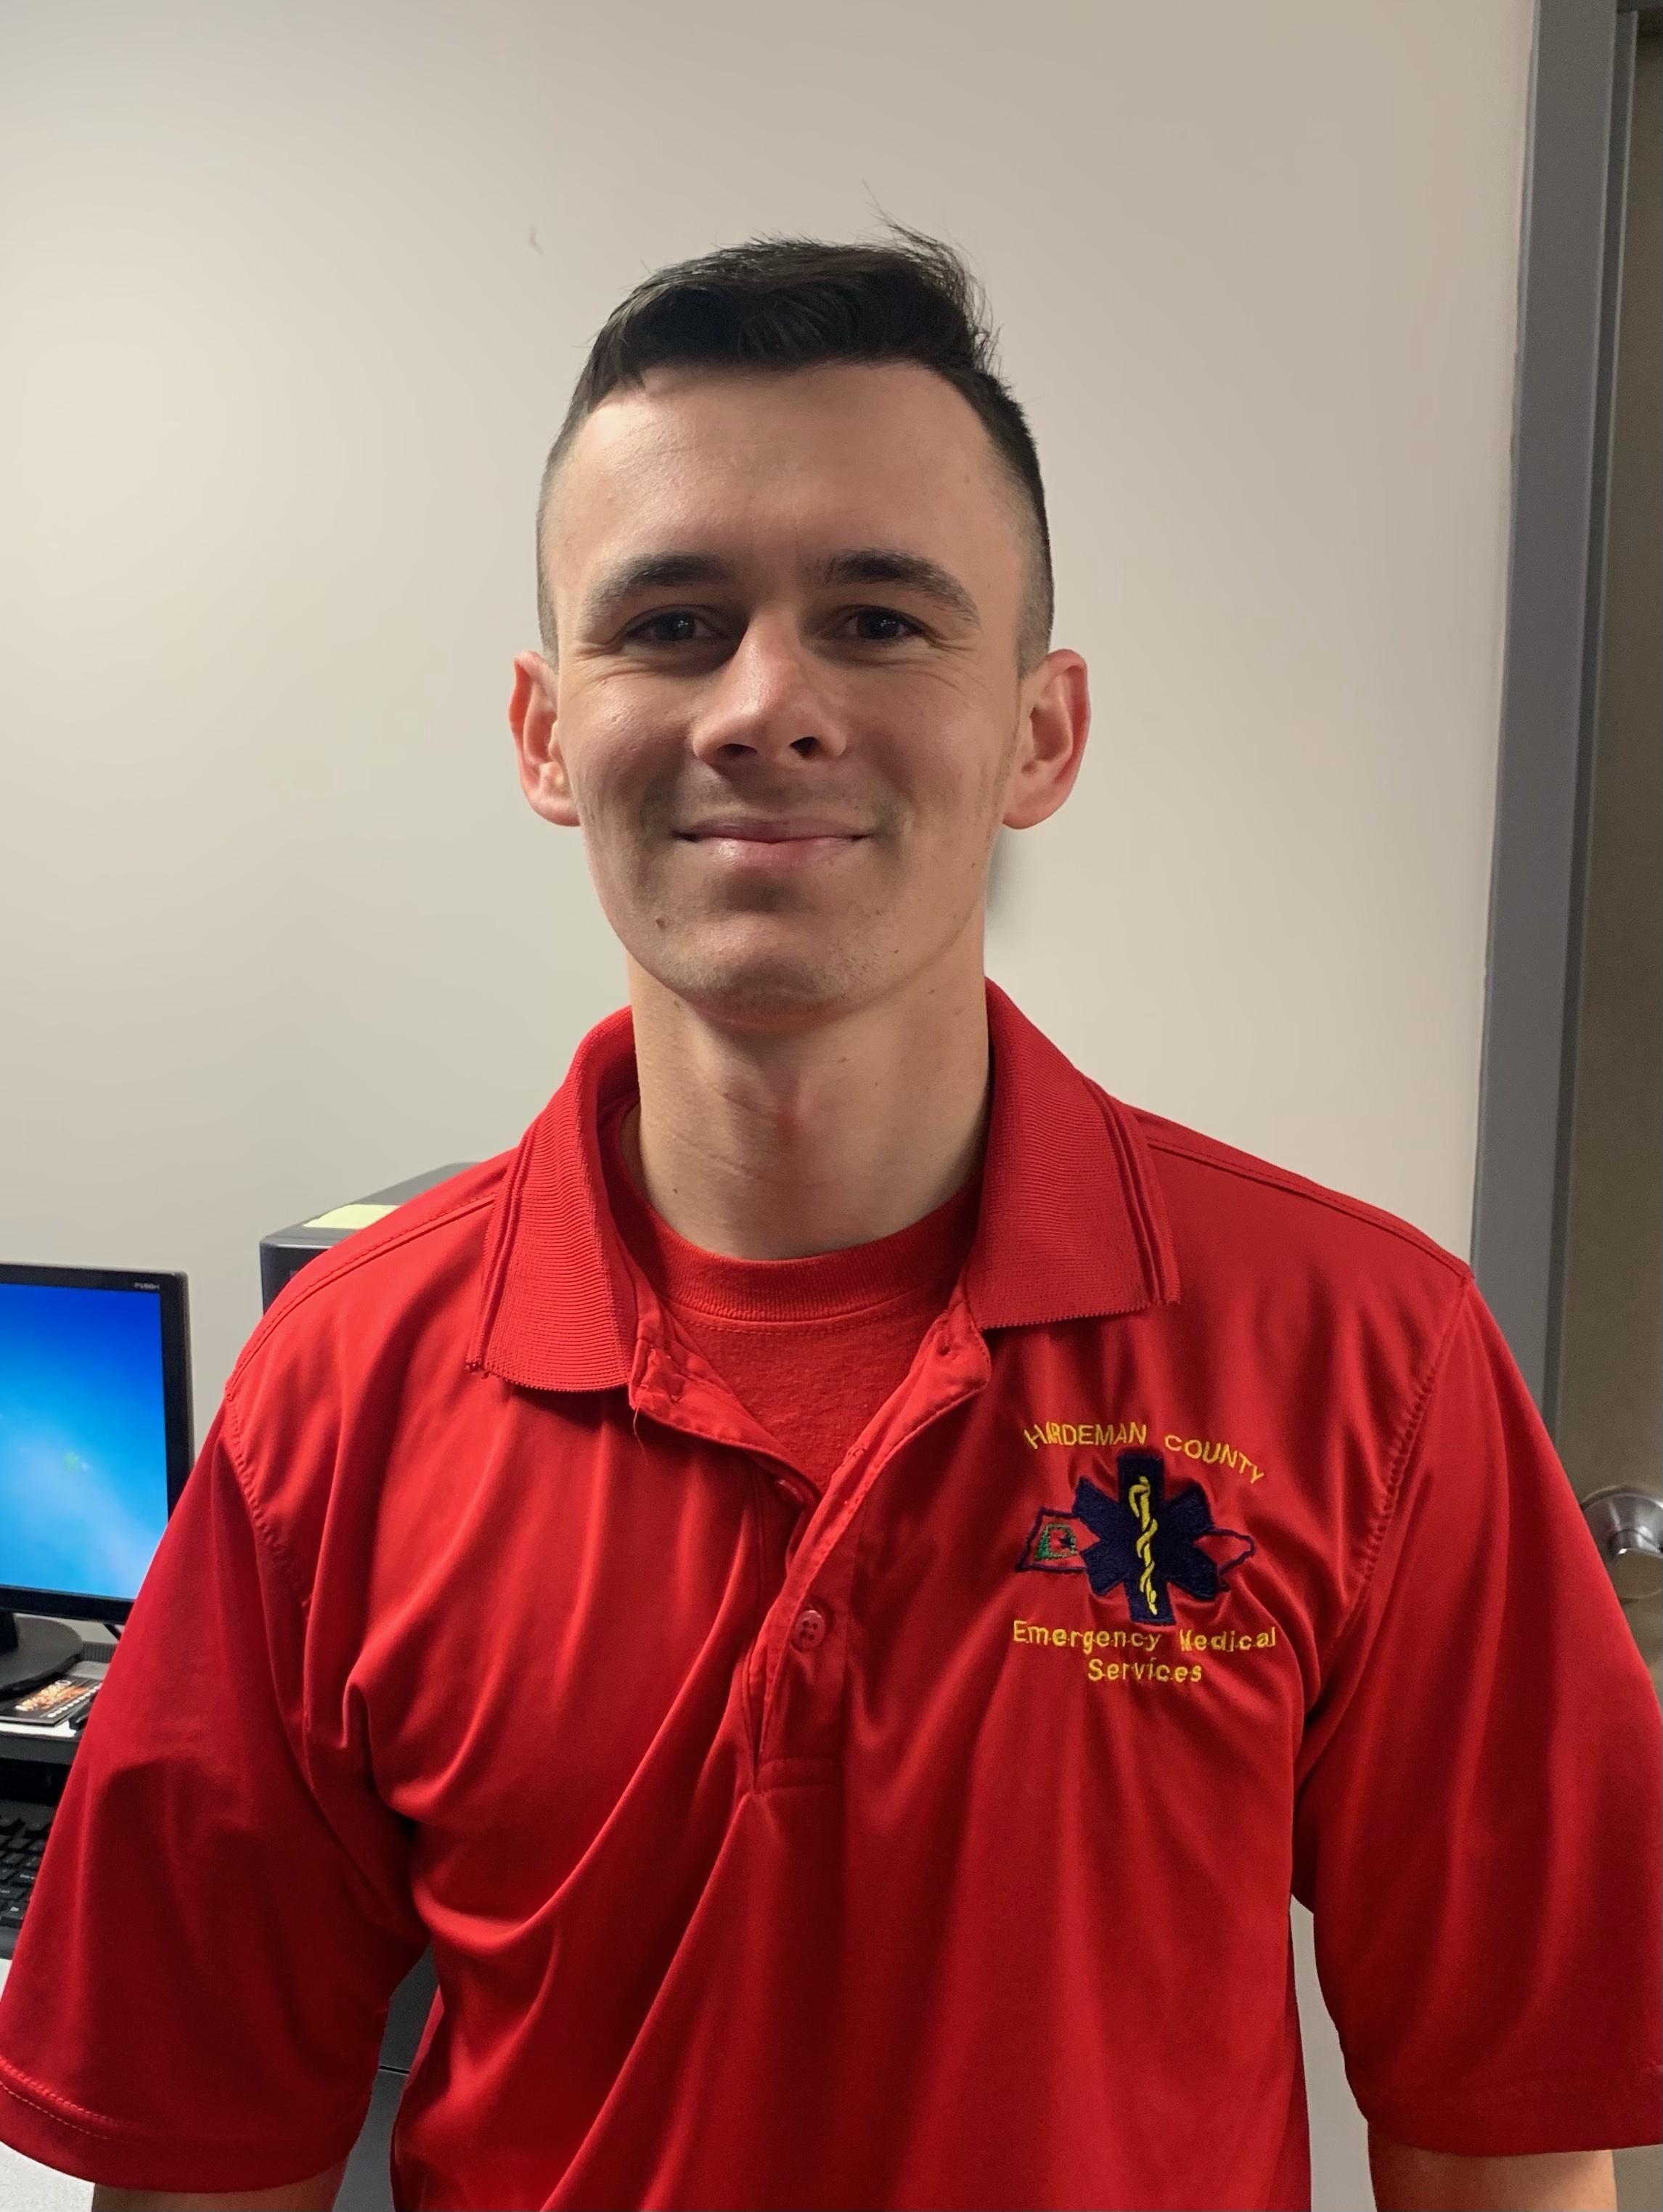 New EMS Employee